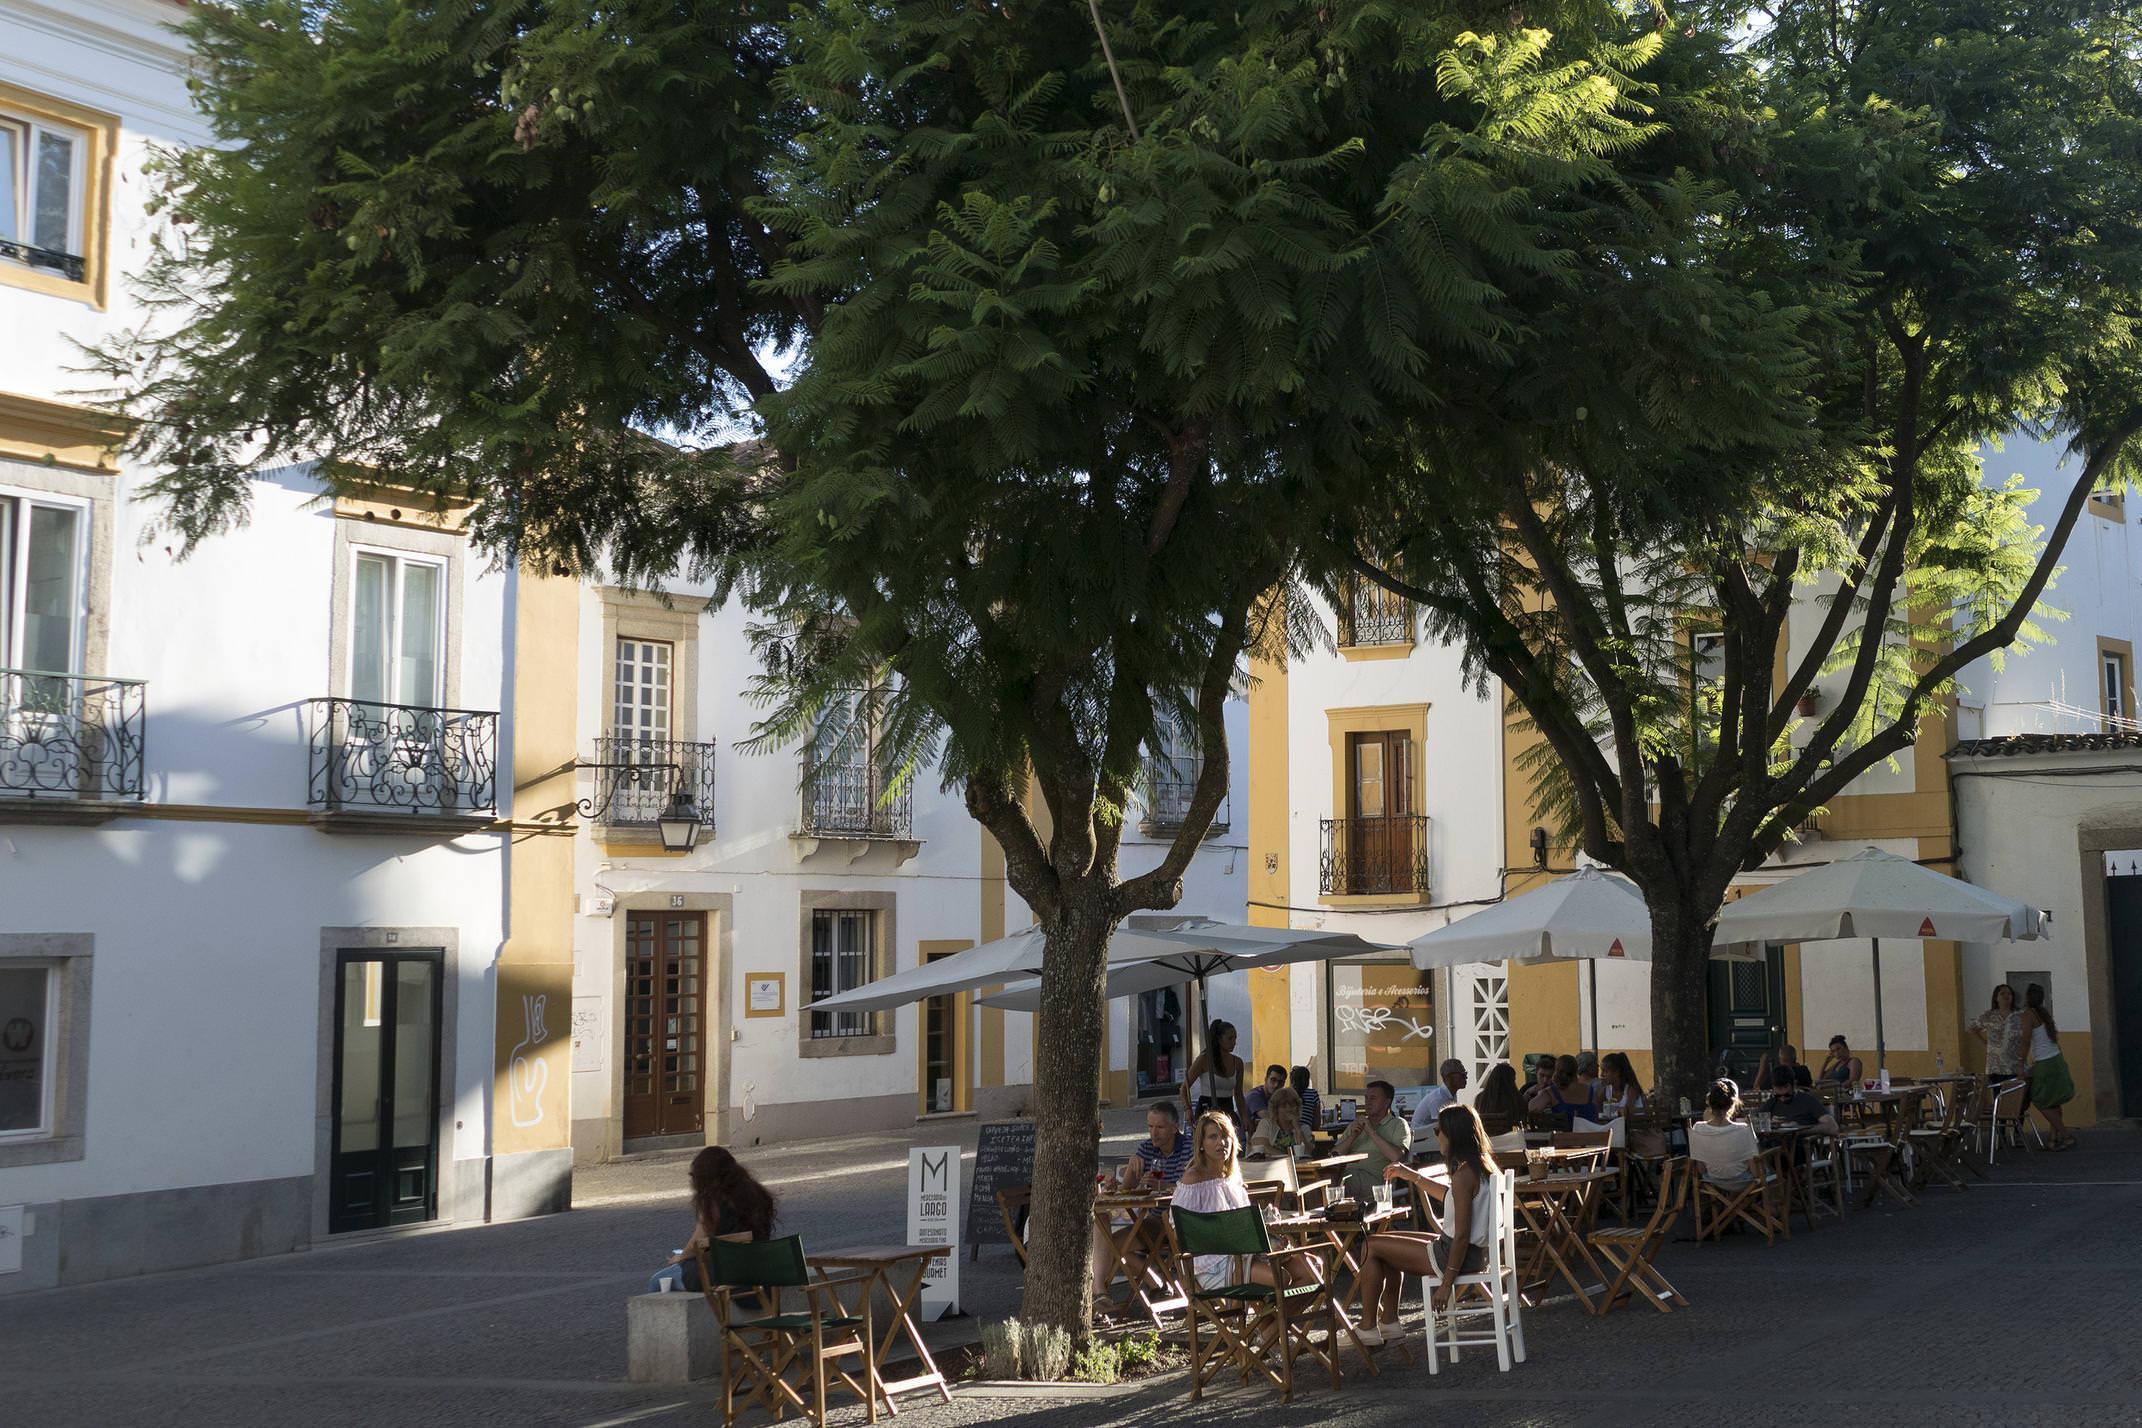 Portugal alentejo evora square